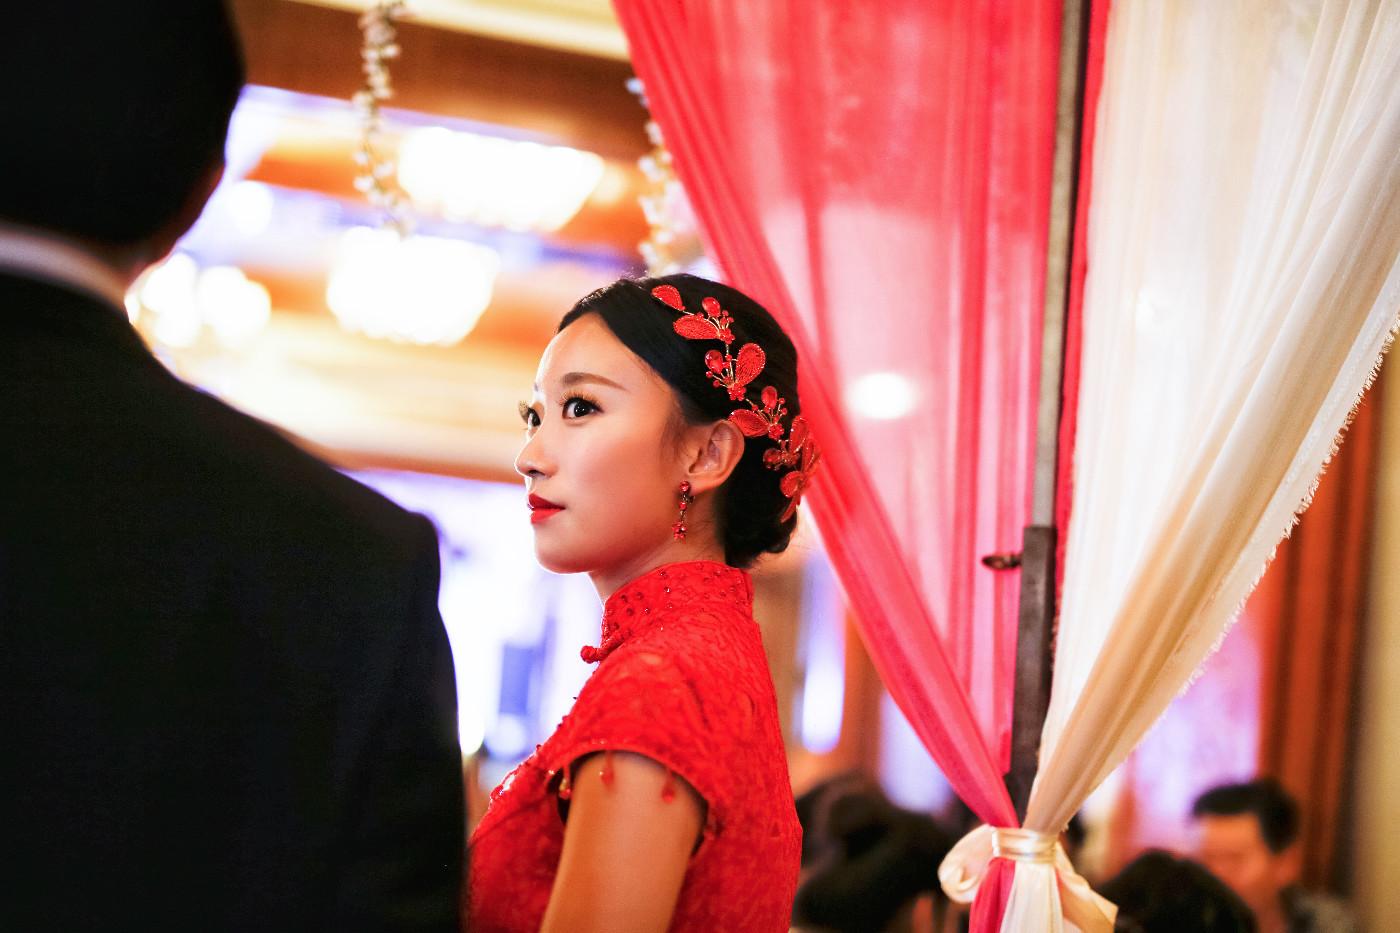 [KAI 婚礼纪实]安徽淮南T&Y36